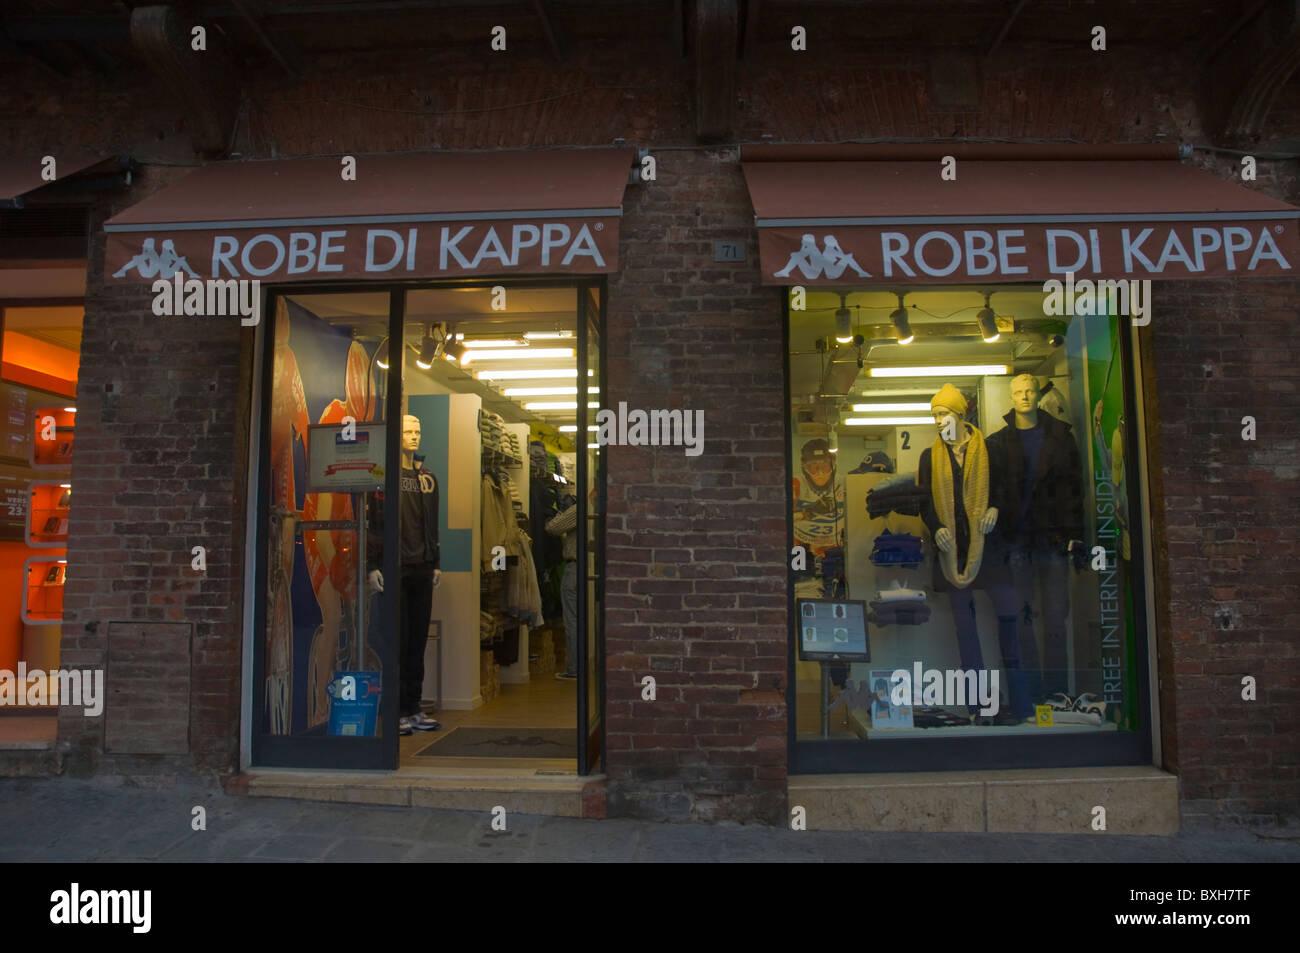 Robe di Kappa shop Siena Tuscany central Italy Europe - Stock Image